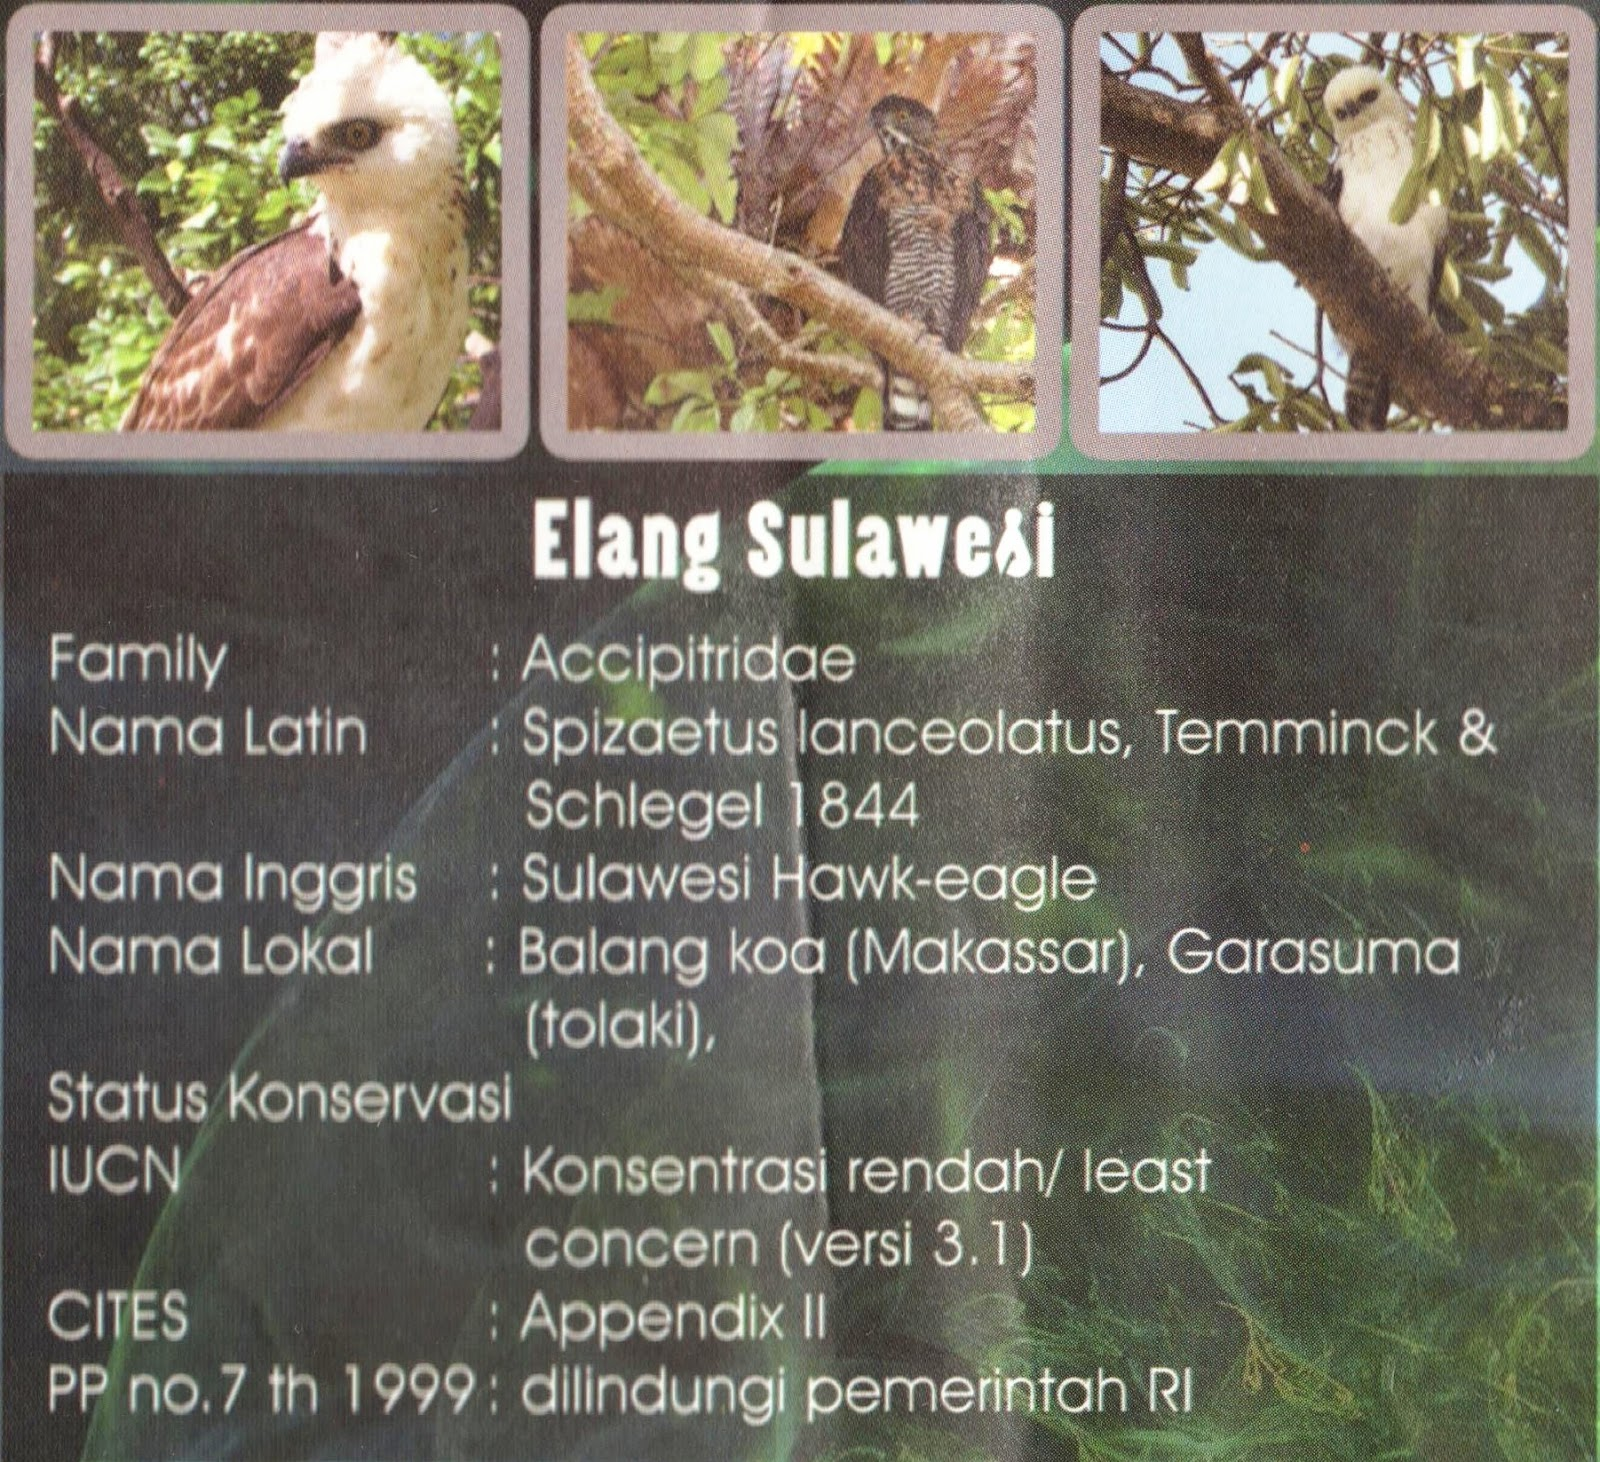 Elang Sulawesi